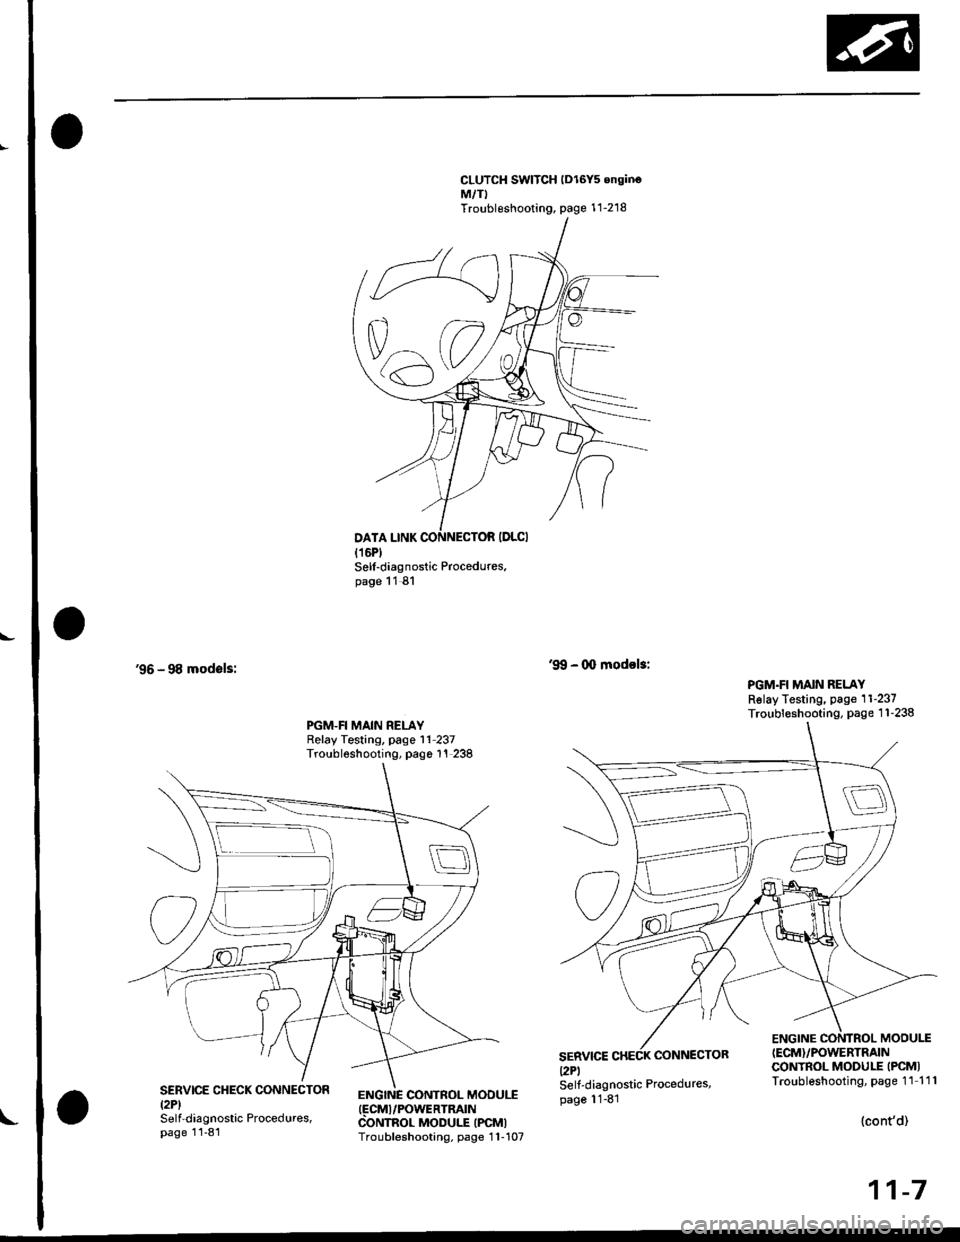 Check engine honda civic 1997 6g workshop manual w960 6068 275 srch check engine obd wiring diagram advertising flowchart obd wiring diagram advertising